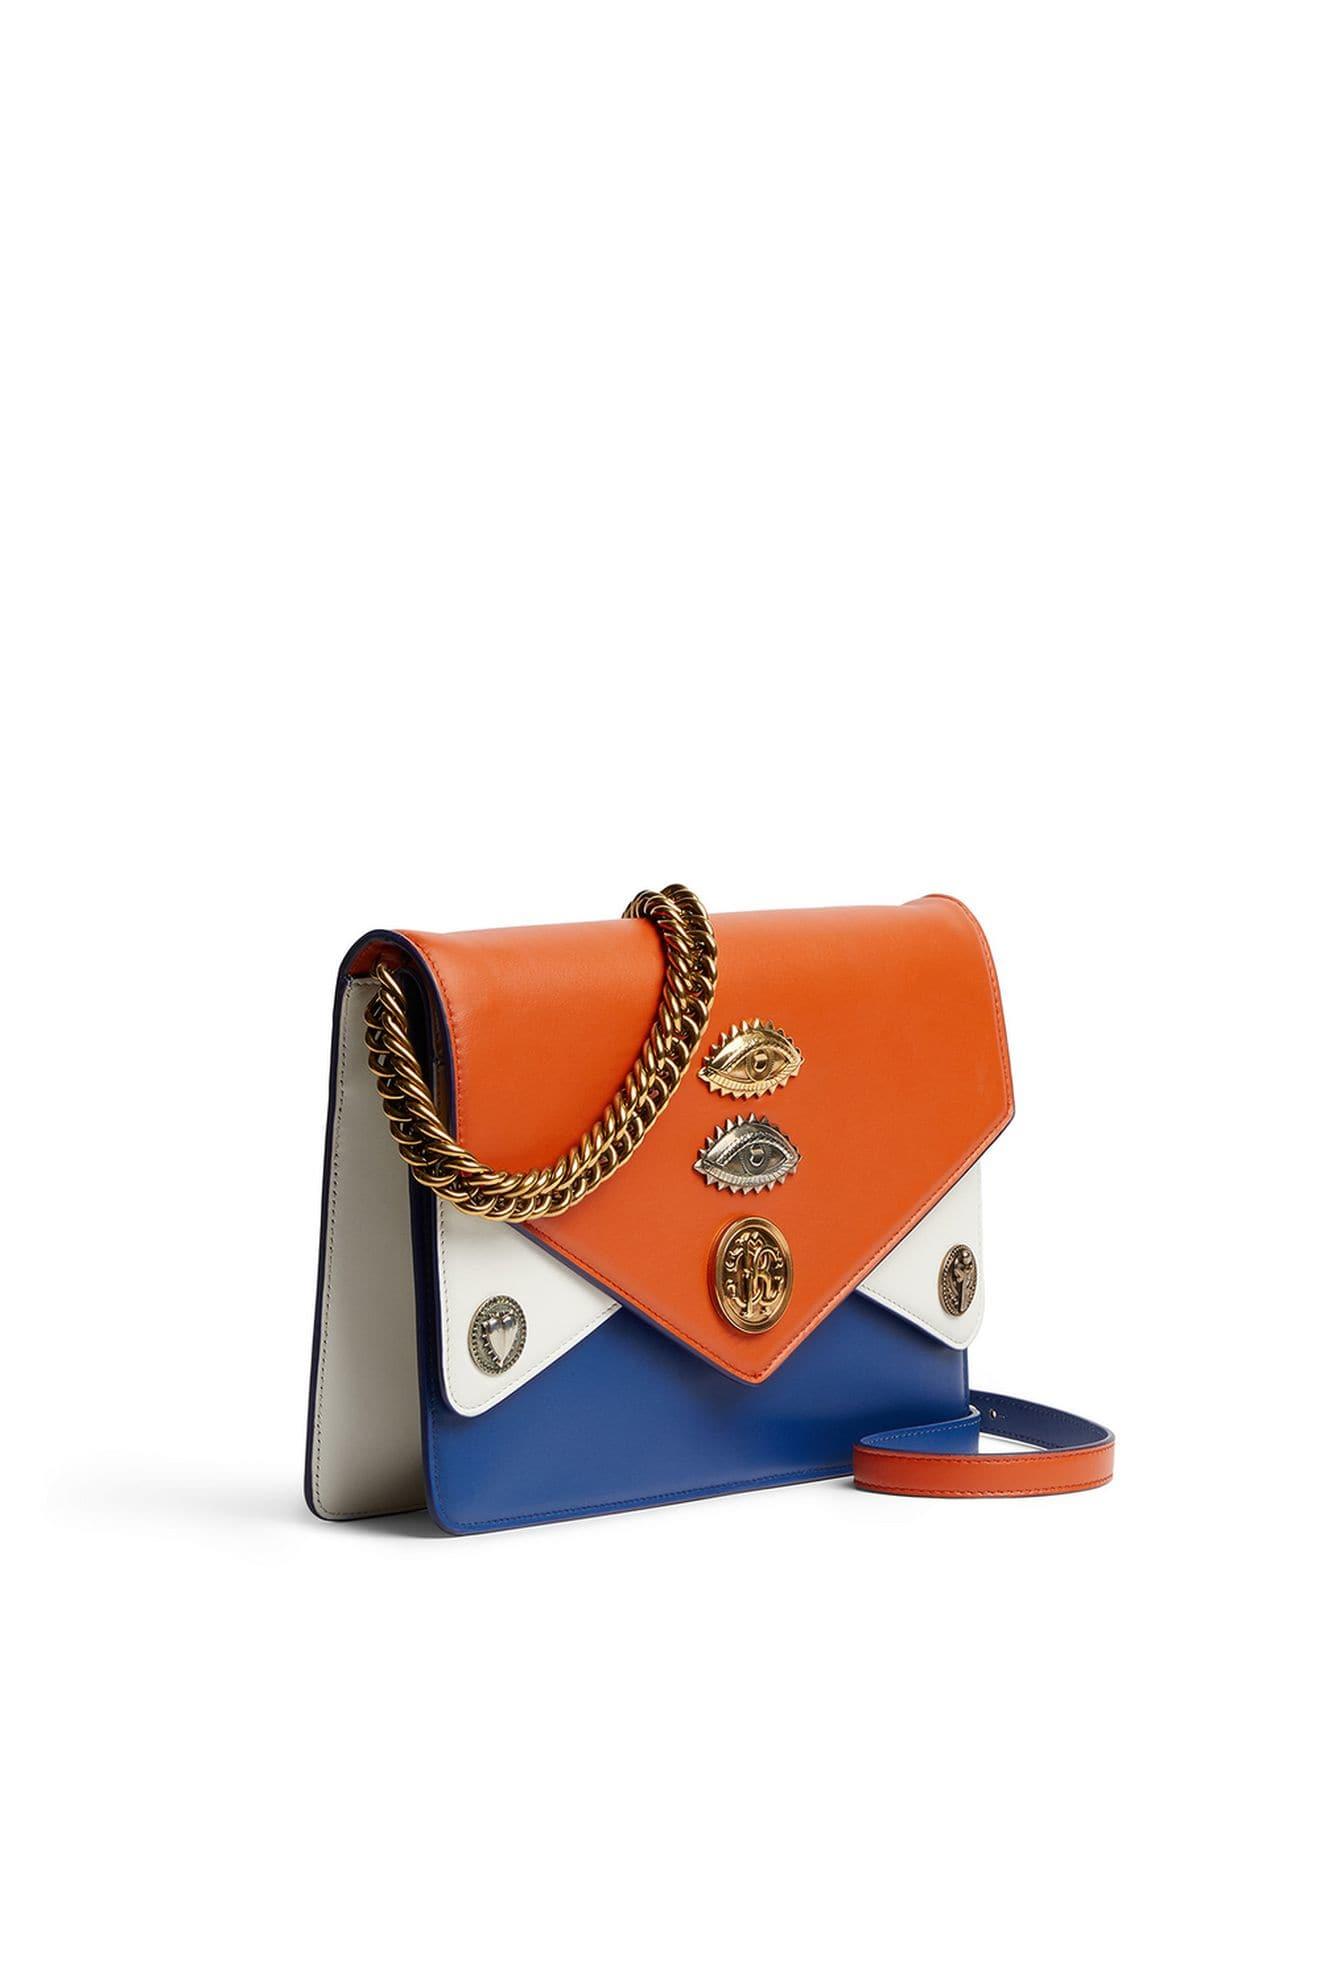 roberto-cavalli-medium-shoulder-bag-with-lucky-symbols_13151035_15413853_1320